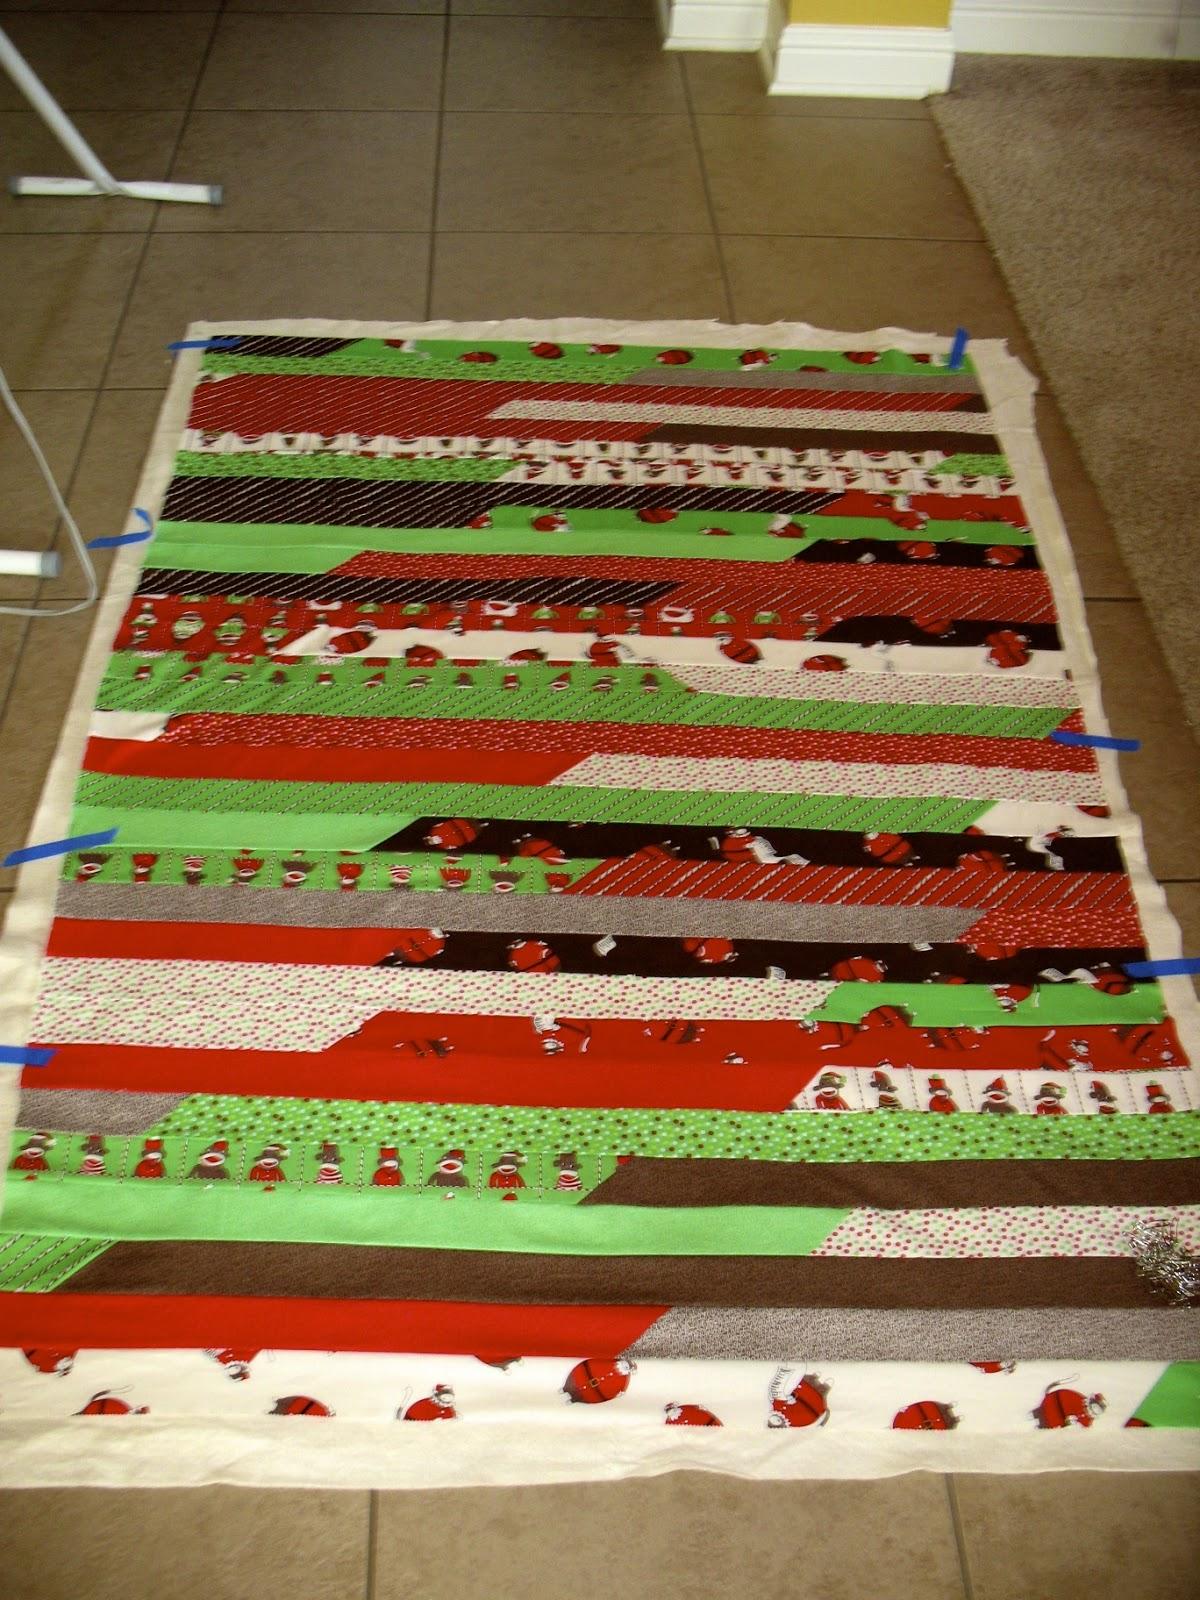 Lasagna Quilt Pattern Jelly Roll : The Tilted Quilt: Lasagna Quilt Tutorial